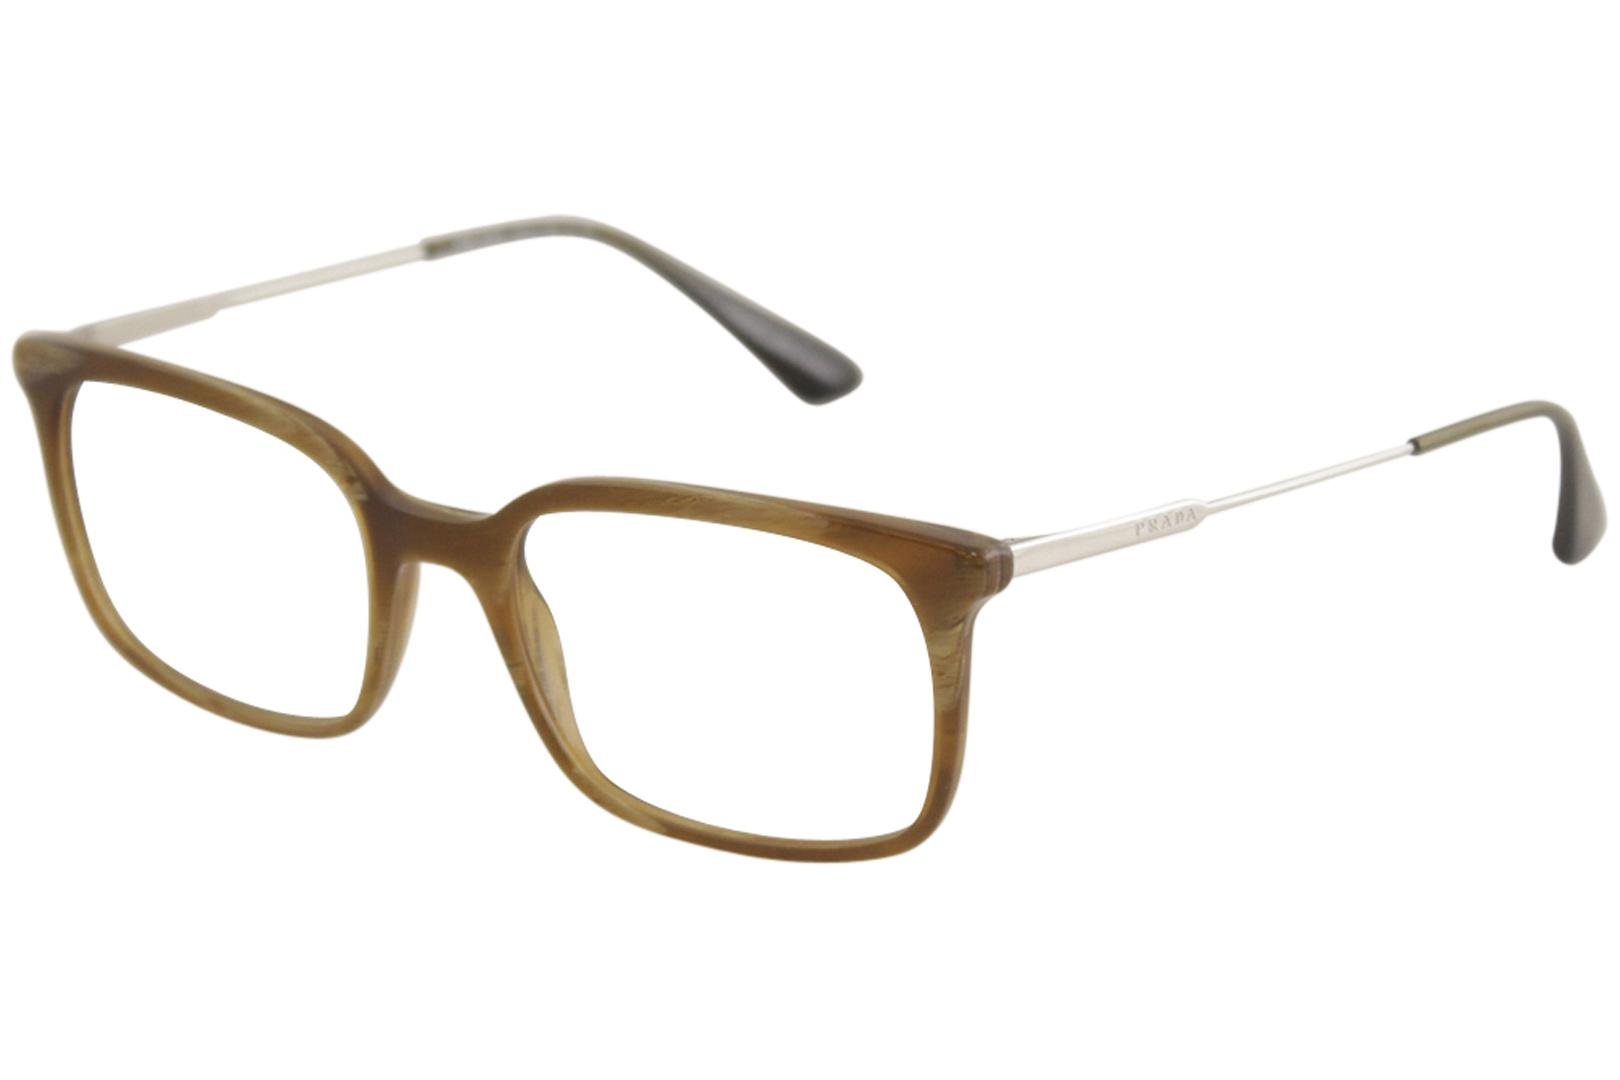 0b1ef401919c Prada Men s Eyeglasses VPR16U VPR 16U Full Rim Optical Frame